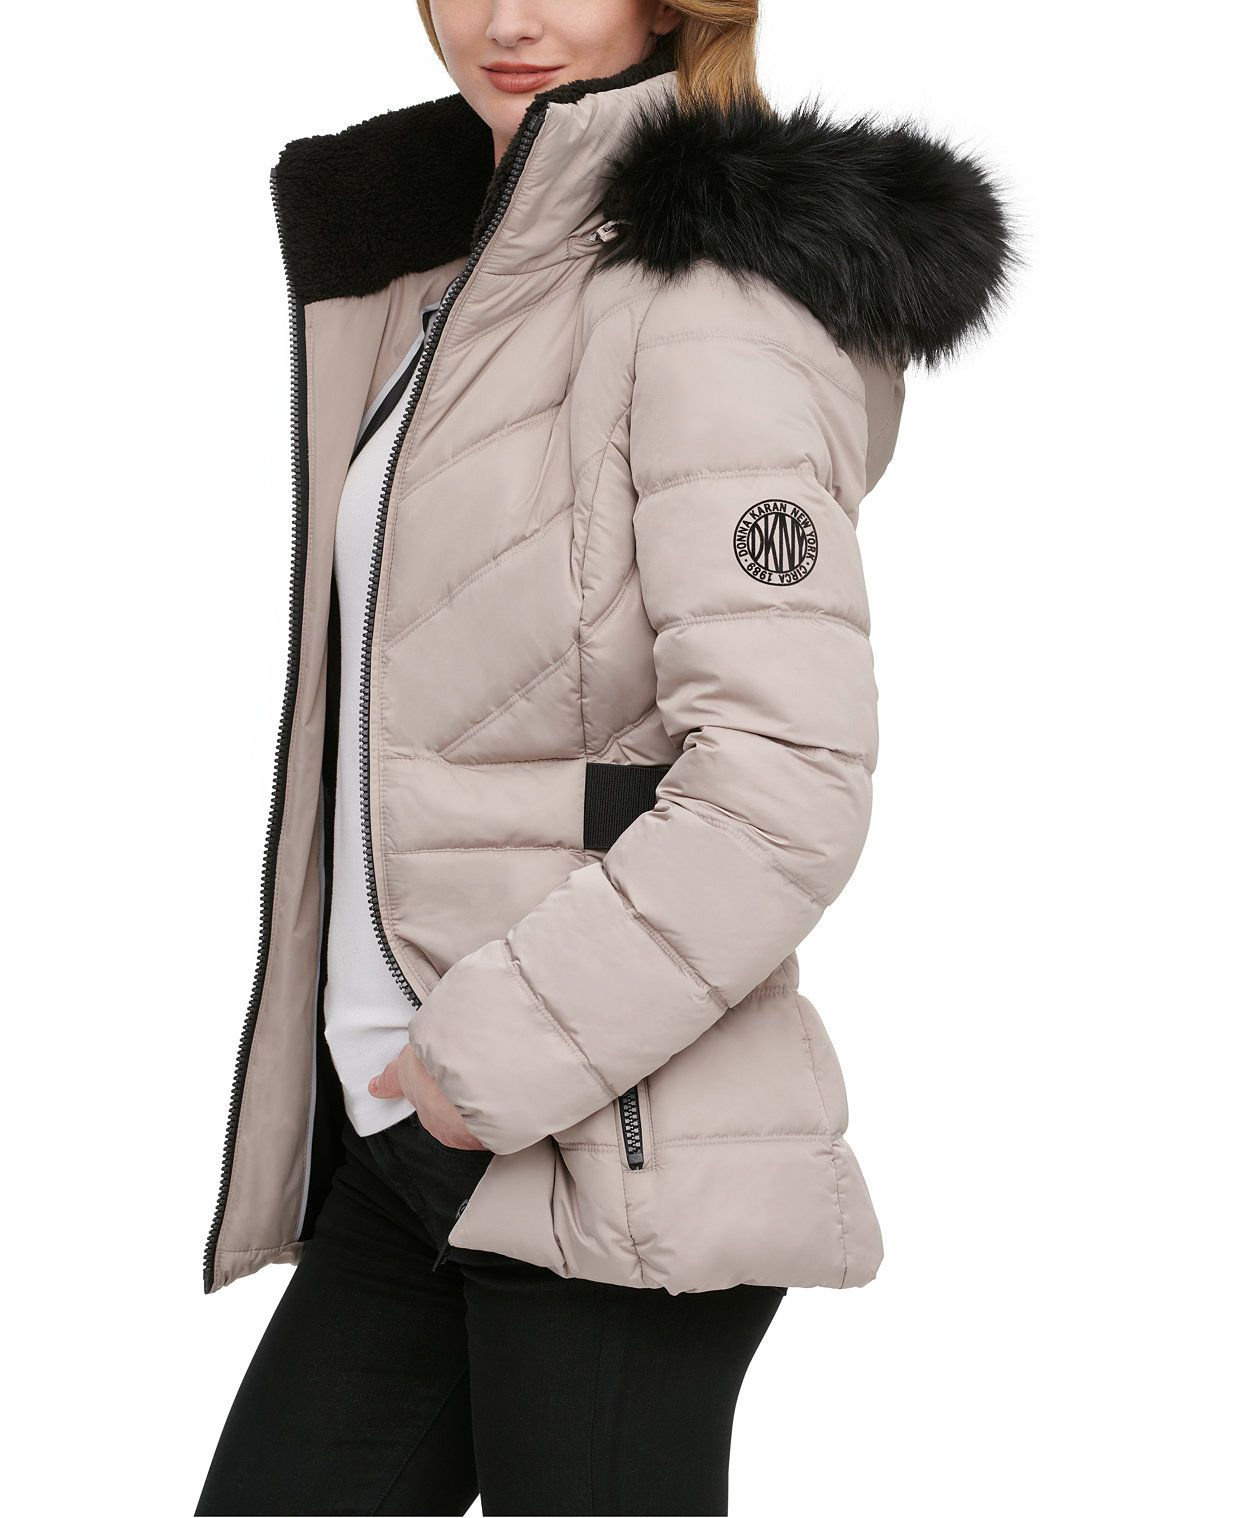 Dkny Faux Fur Trim Hooded Puffer Coat Reviews Coats Women Macy S In 2021 Puffer Coat Fur Trim Coats For Women [ 1518 x 1242 Pixel ]